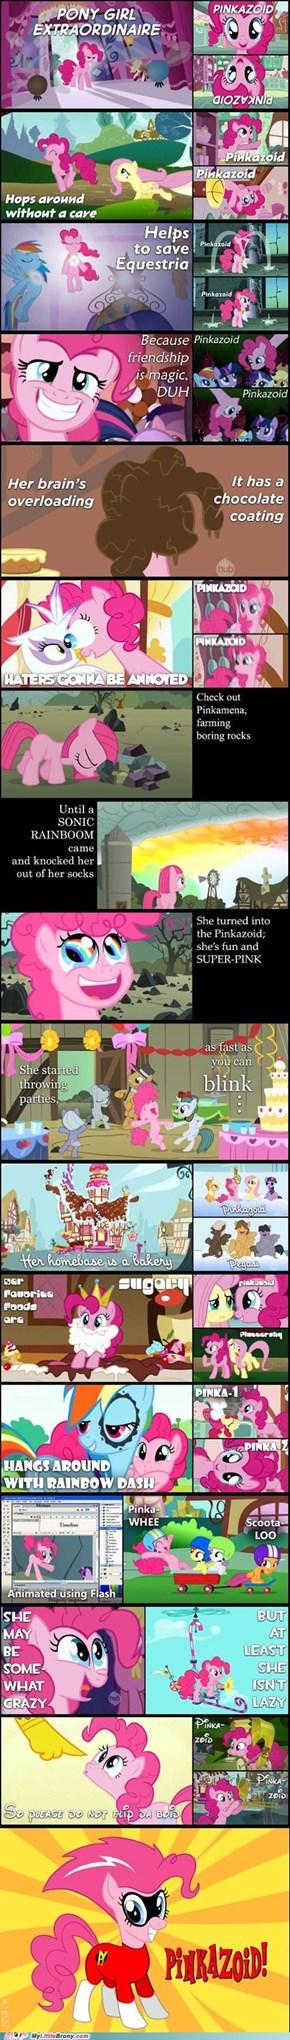 Pinkazoid!